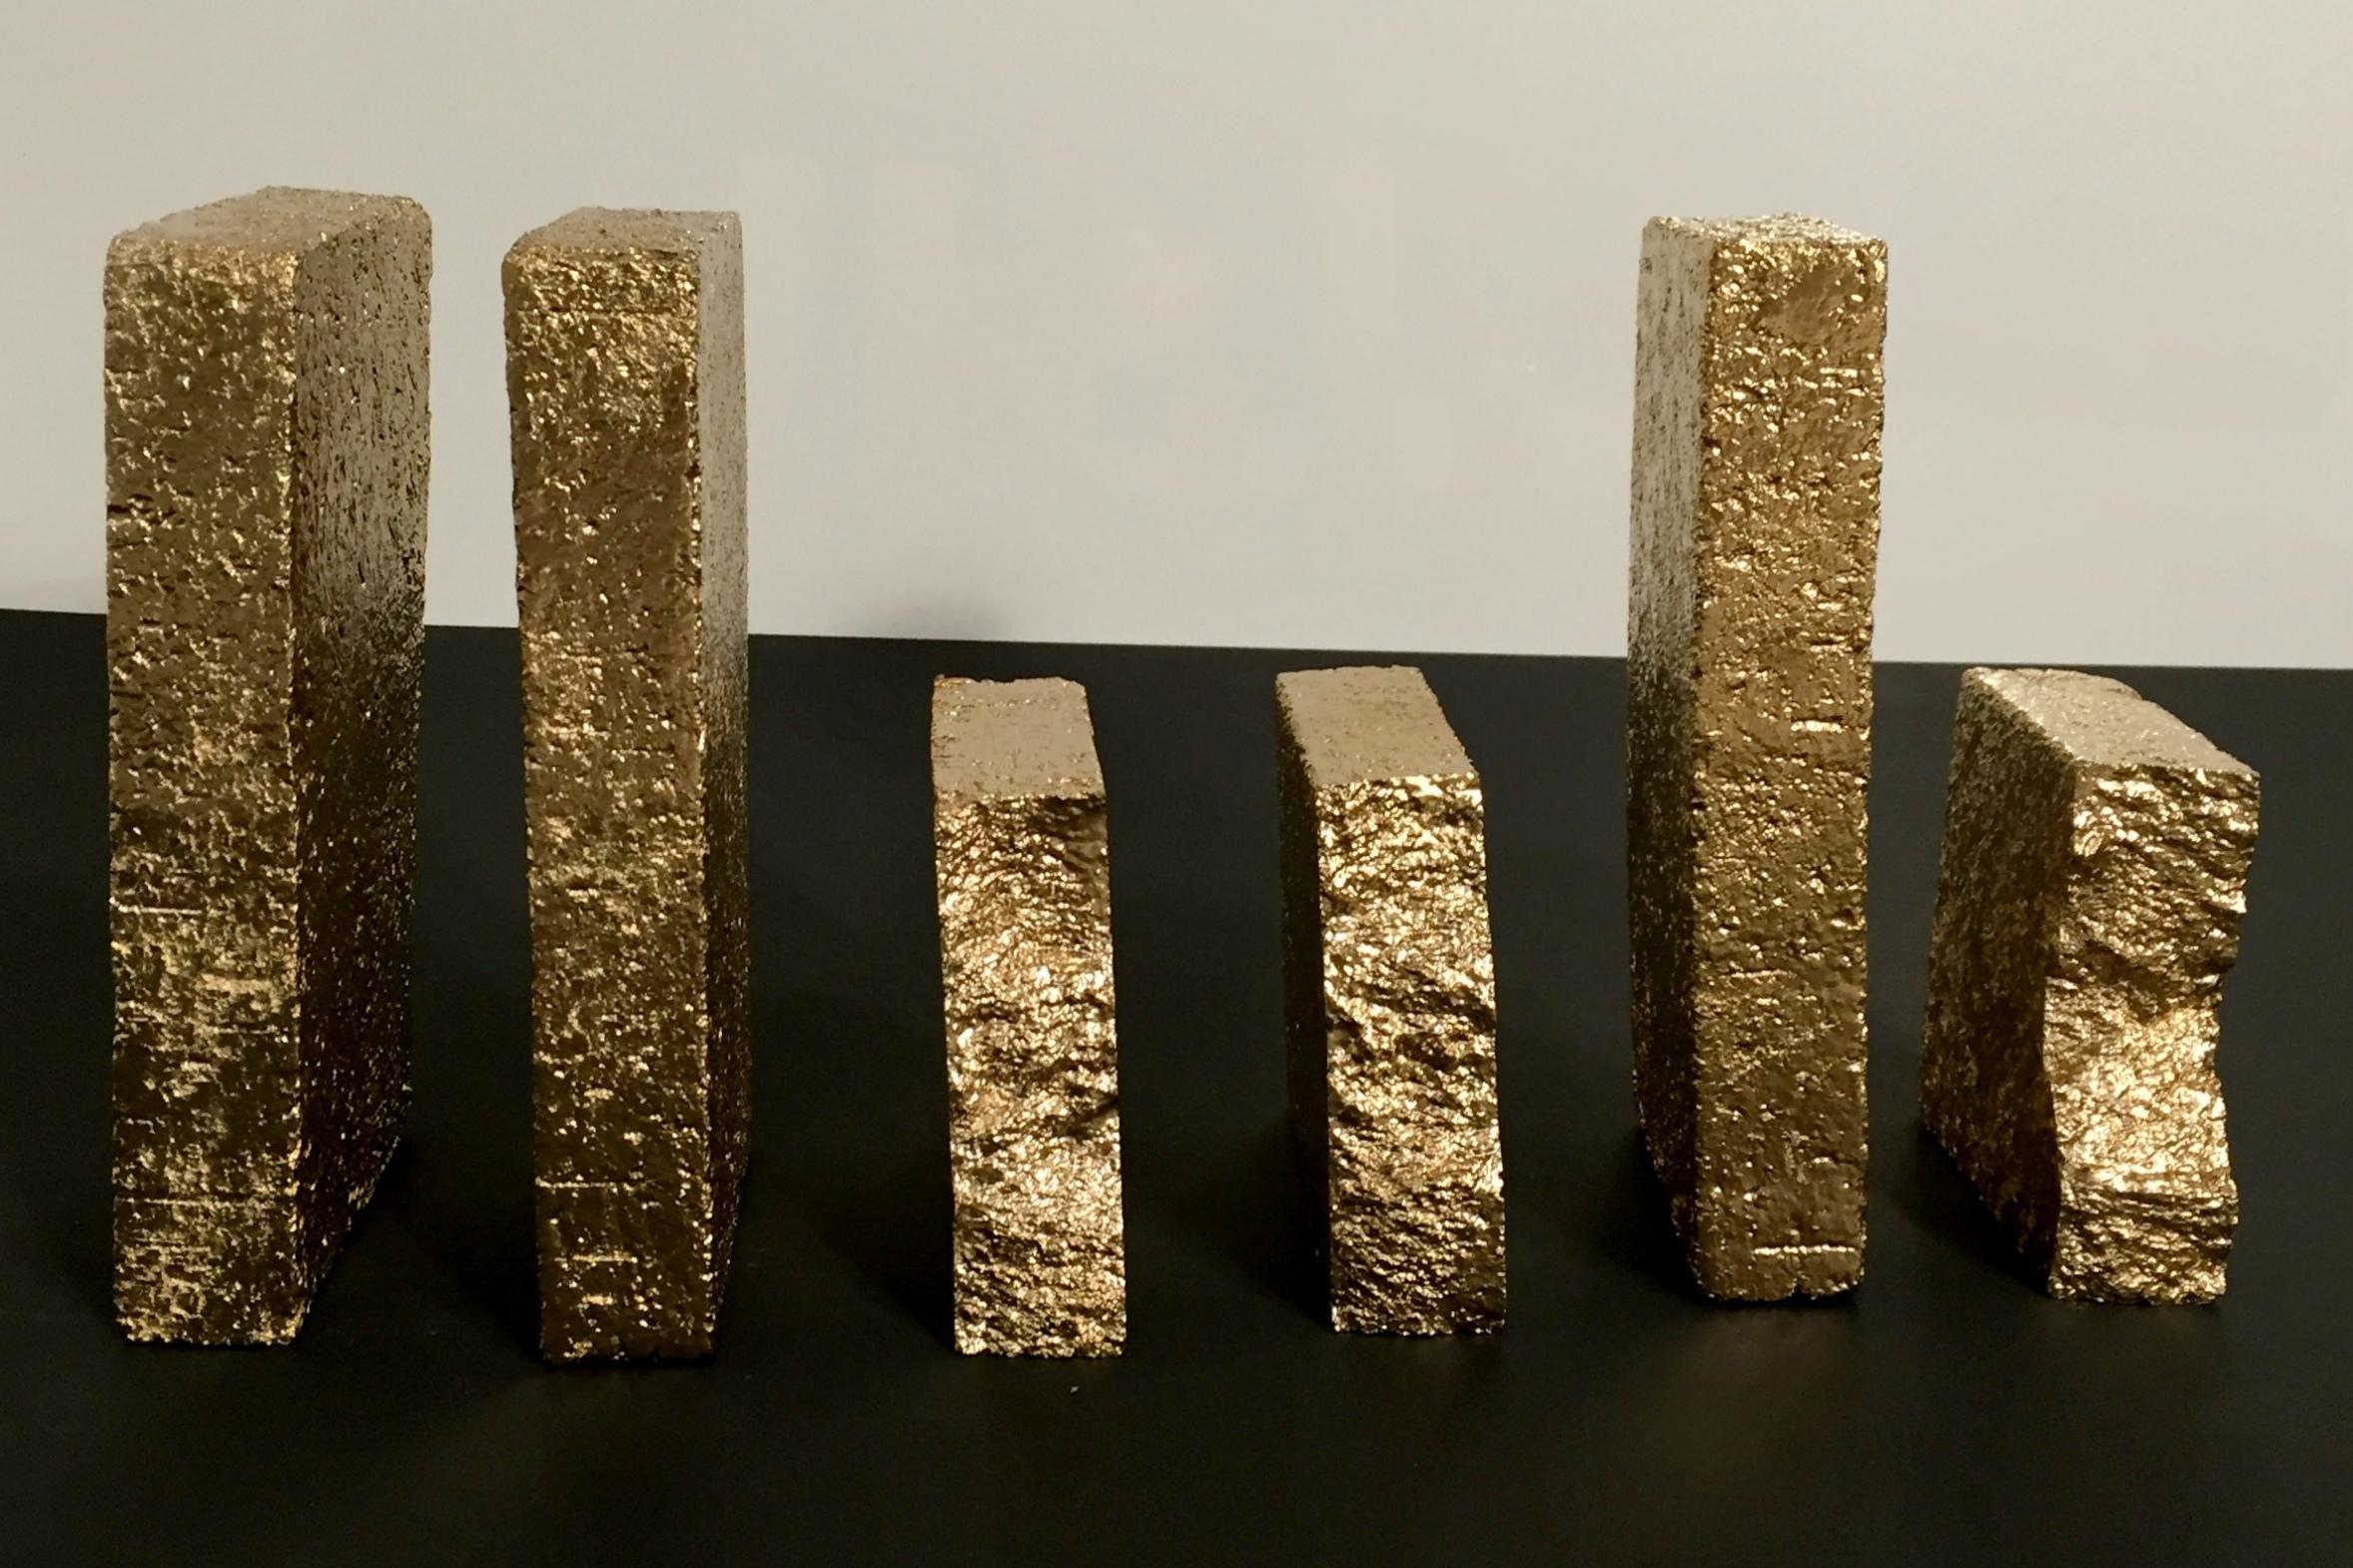 BRICK MxE (Gold) 3+3/2 bricks & acrylic, December 24, 2016